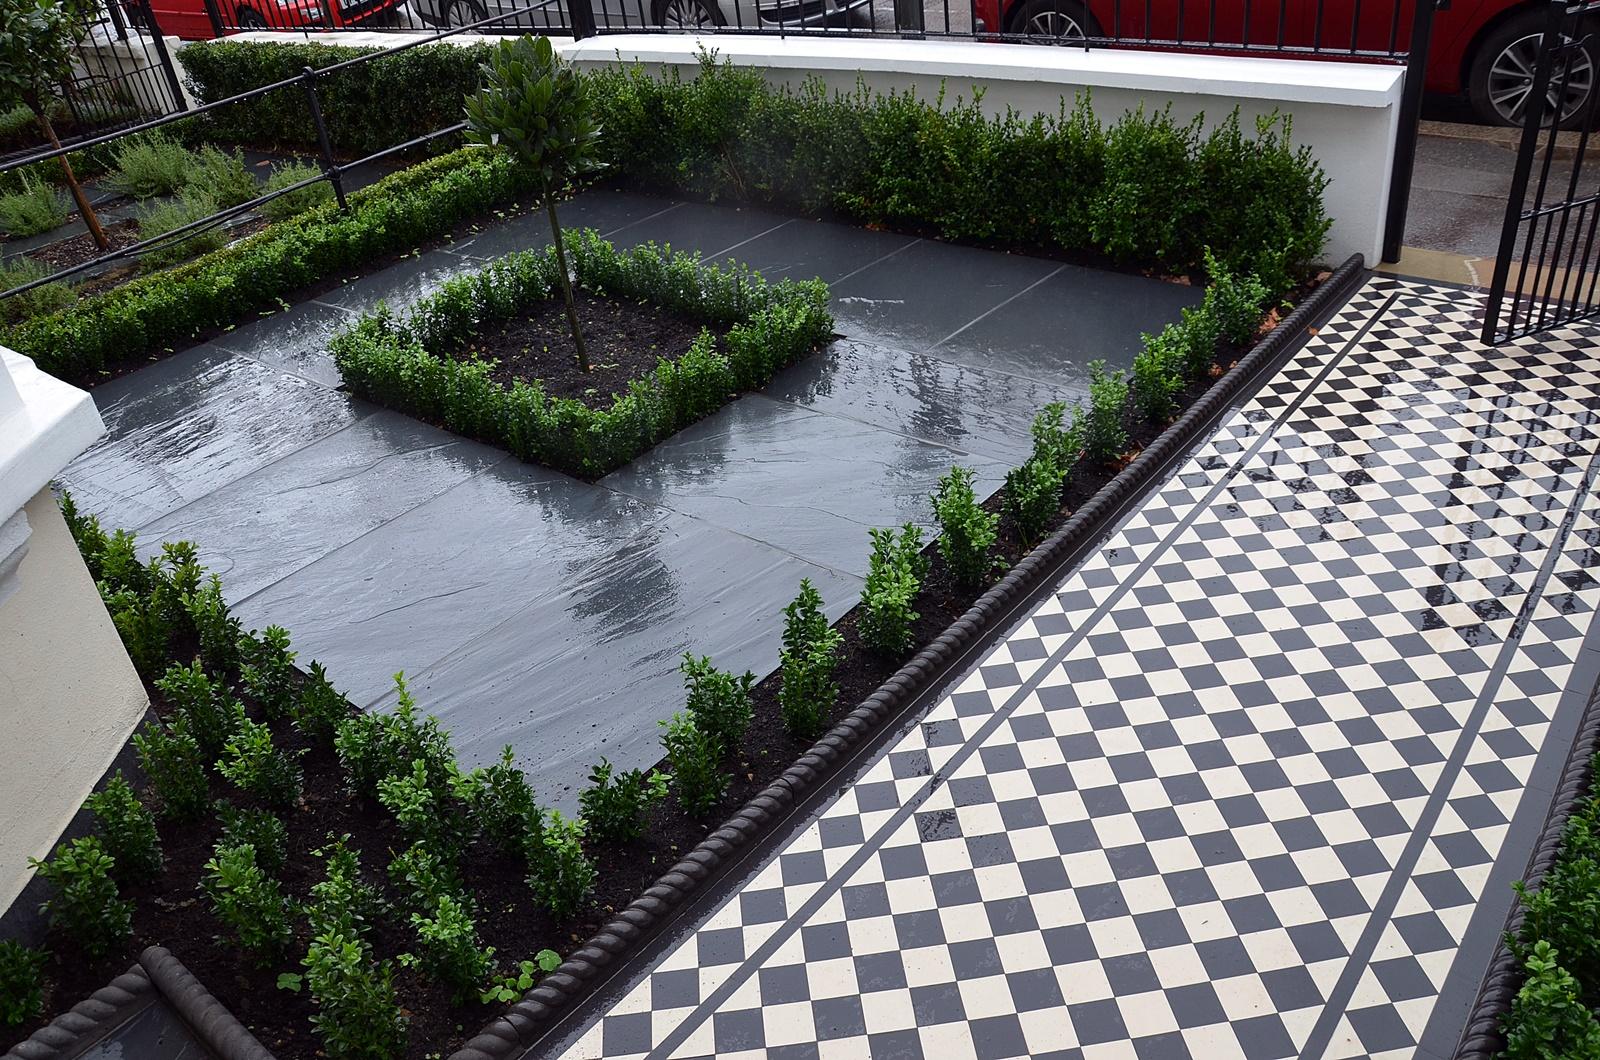 charcoal-rope-edge-victorian-classic-mosaic-black-and-white-path-slate-paving-london-clapham-balham-wandsworth